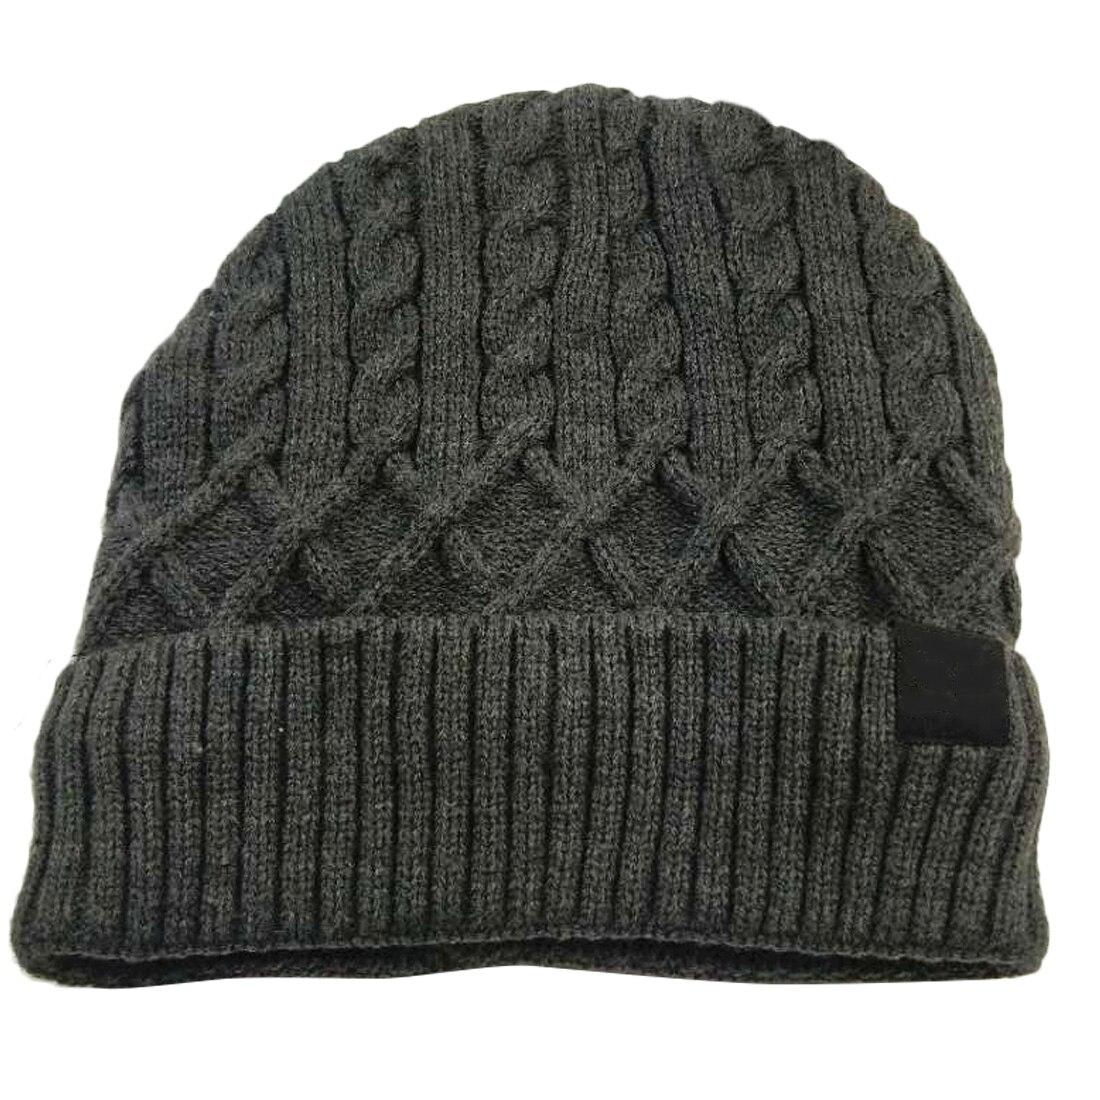 Hats Soft comfortable Trending Twisted wool hat New Fashion Winter Hat Women Man Cap Skullies Beanies Unisex Warm in Men 39 s Skullies amp Beanies from Apparel Accessories